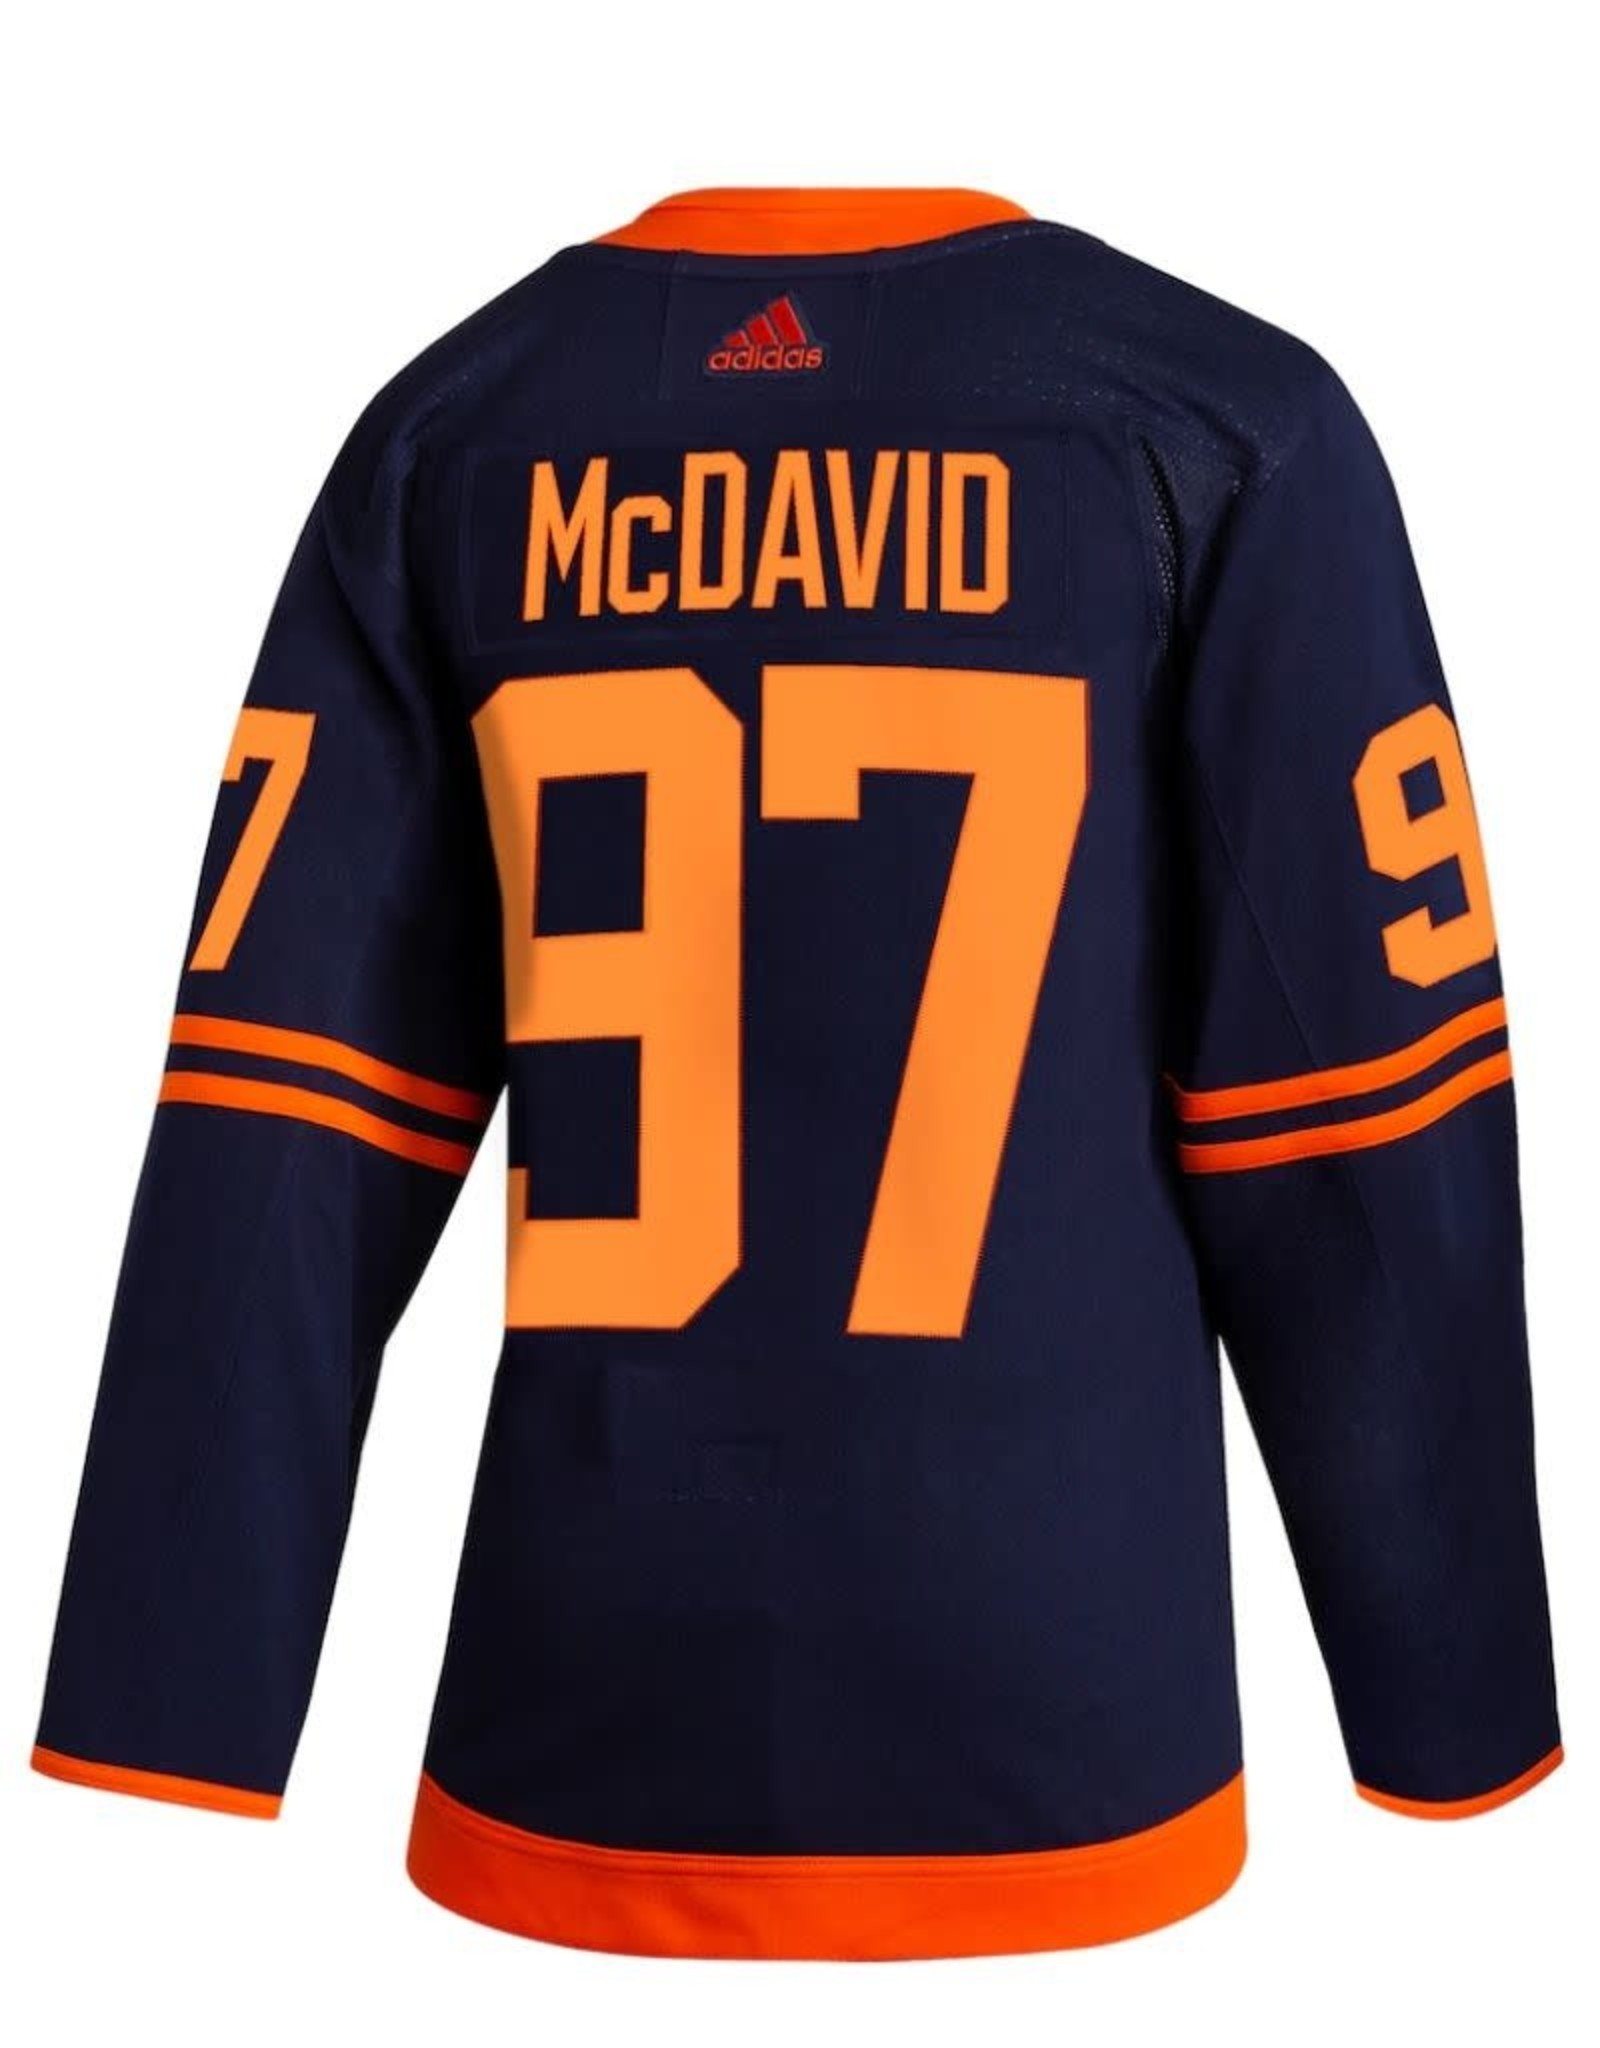 Adidas Adidas Adult Authentic Edmonton Oilers McDavid Jersey Navy